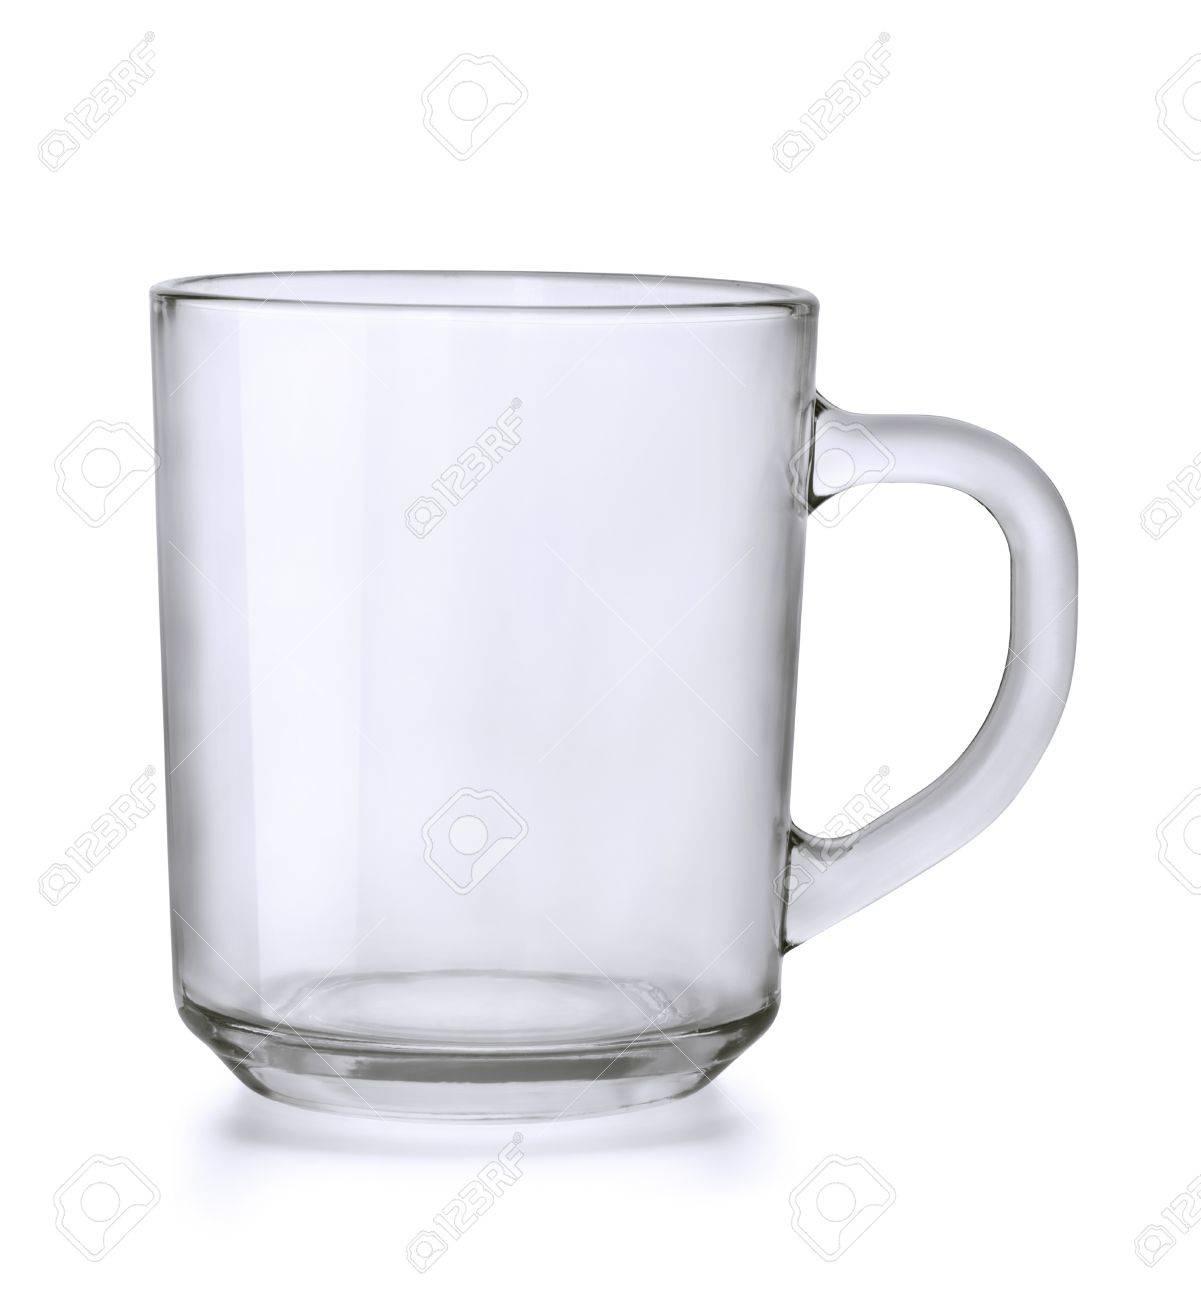 Empty glass tea mug isolated on white Stock Photo - 13336479